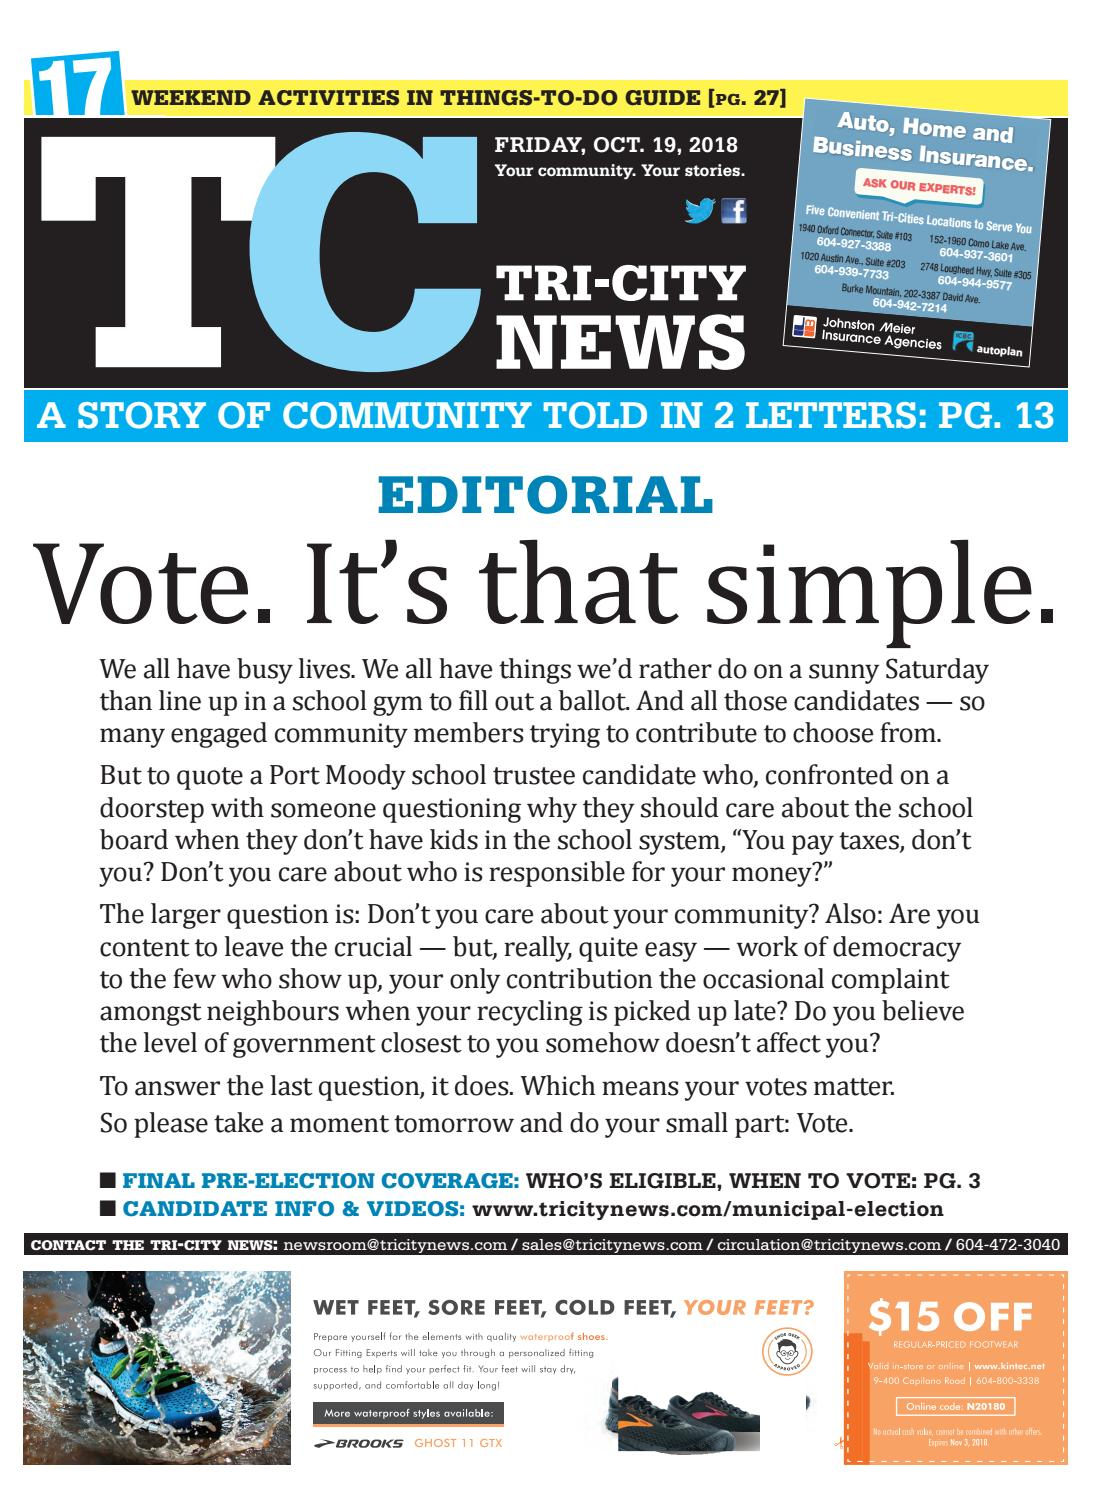 029b206a9cd Tri-City News October 19 2018 by Tri-City News - issuu